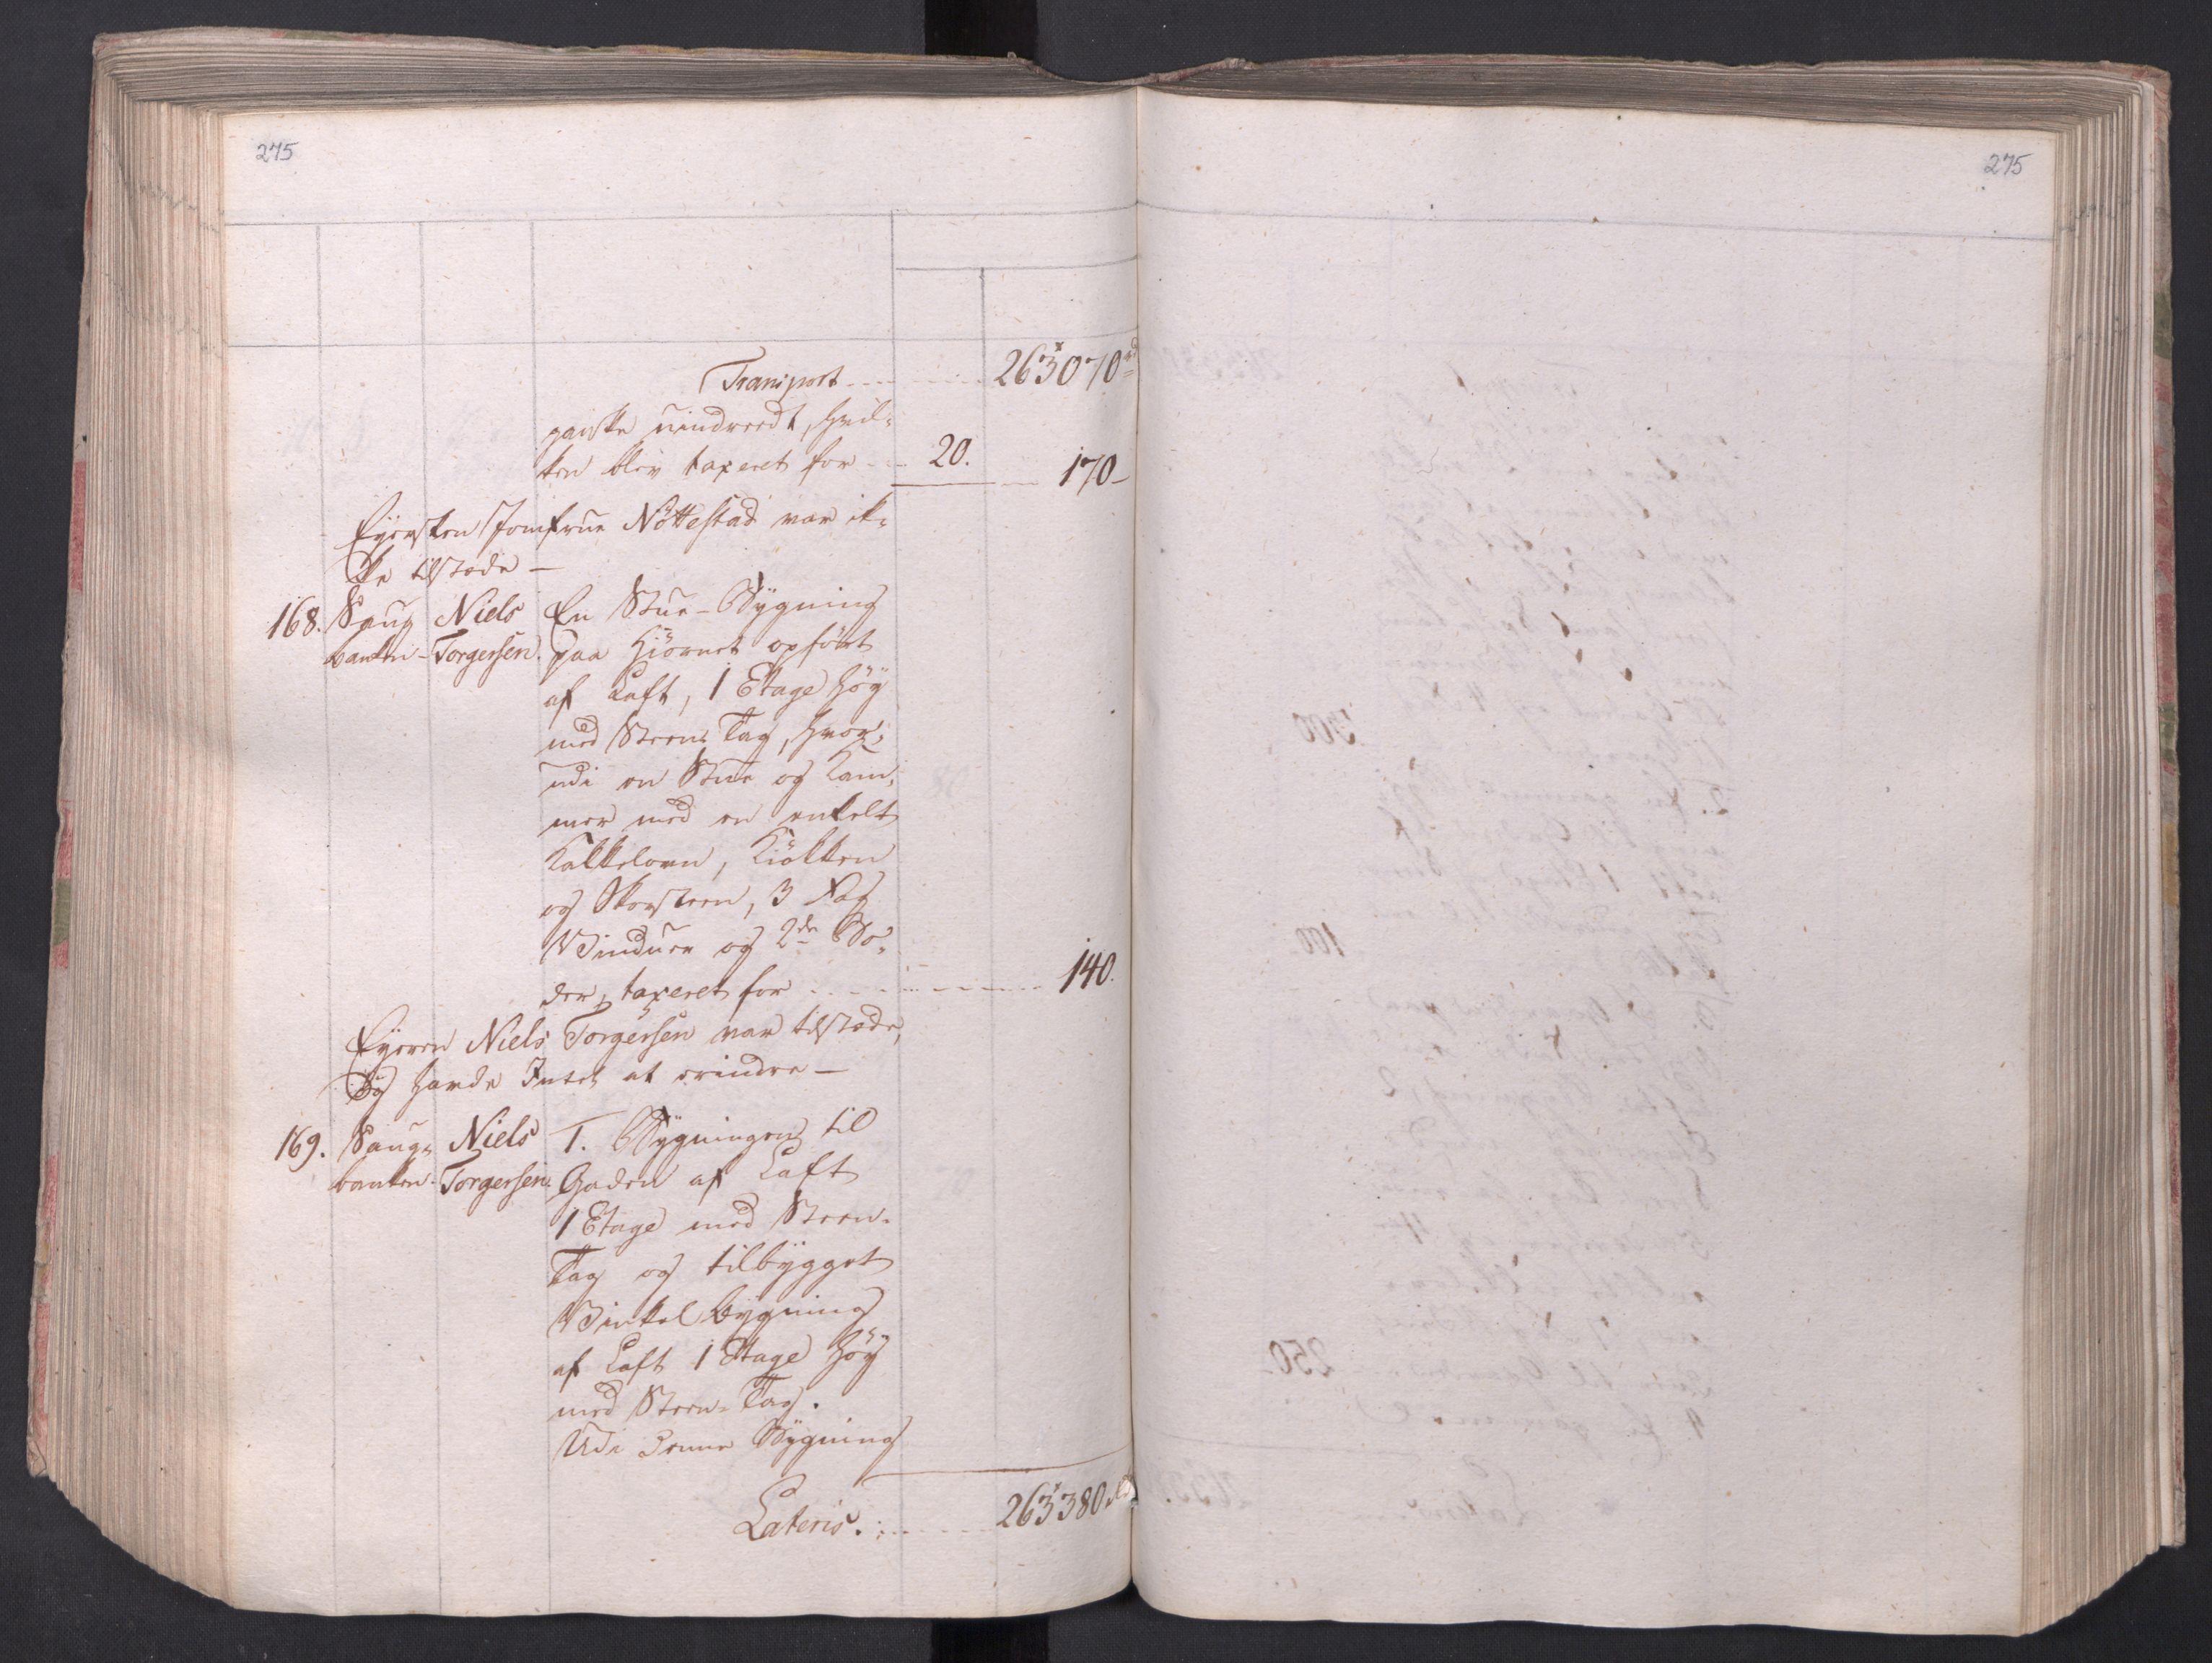 SAO, Kristiania stiftamt, I/Ia/L0015: Branntakster, 1797, s. 275